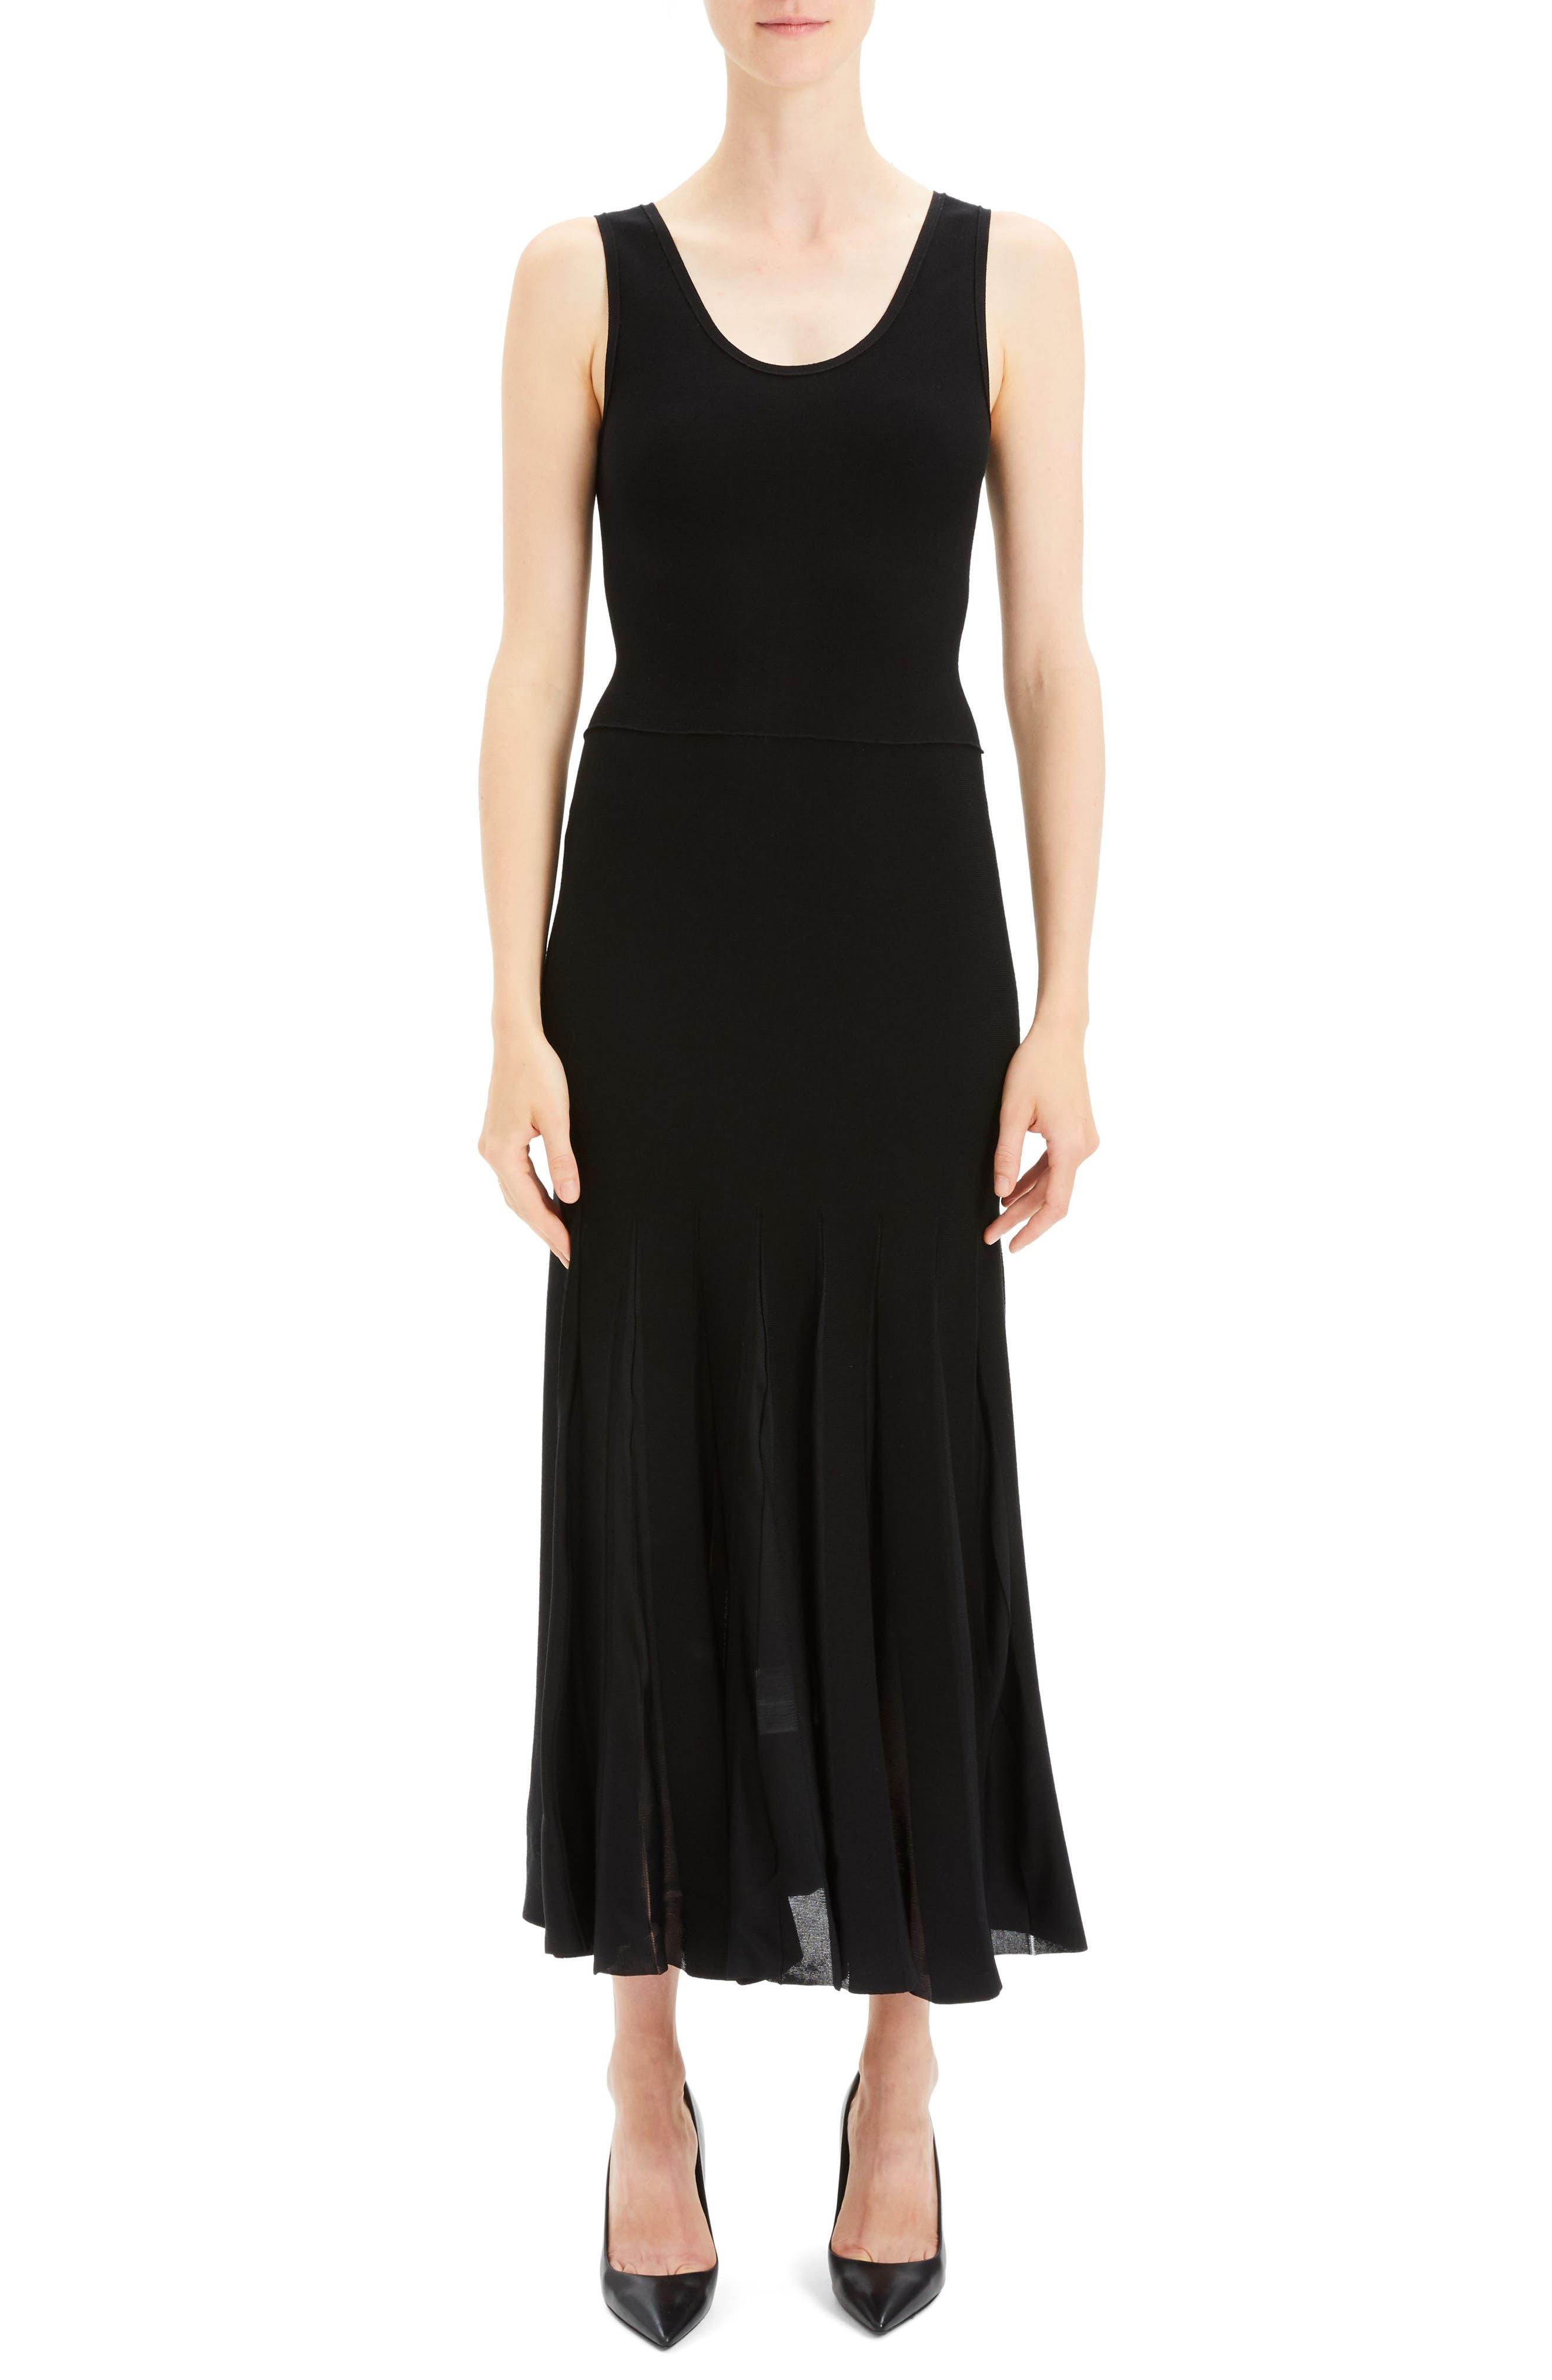 Theory Pleated Tank Dress, Size Petite - Black